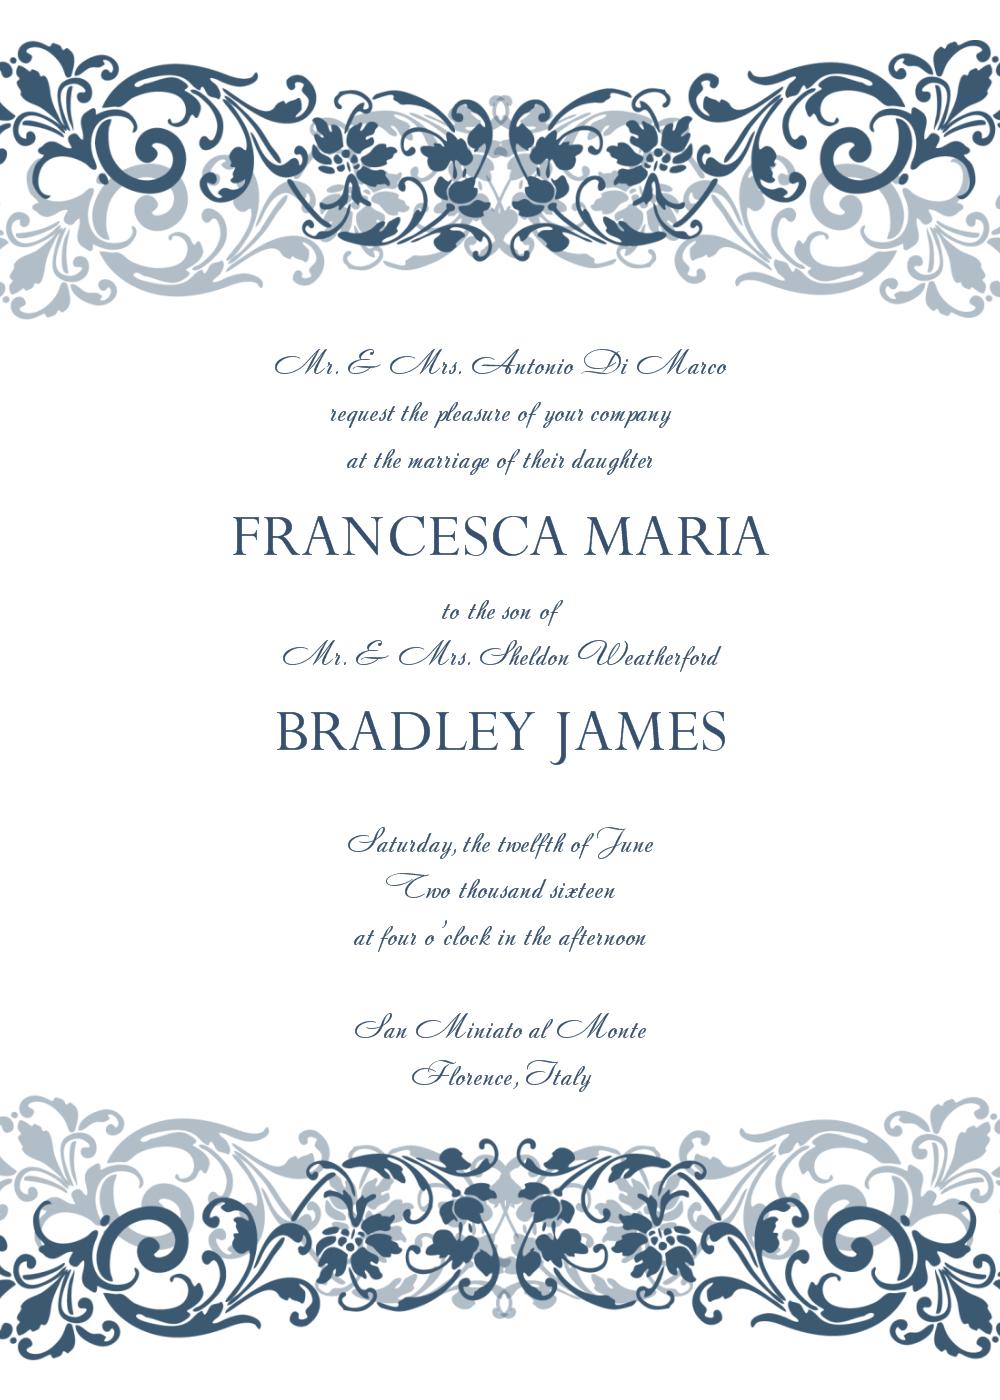 Wedding Invitation Templates | Invitation | Pinterest | Free Wedding - Free Printable Wedding Invitations